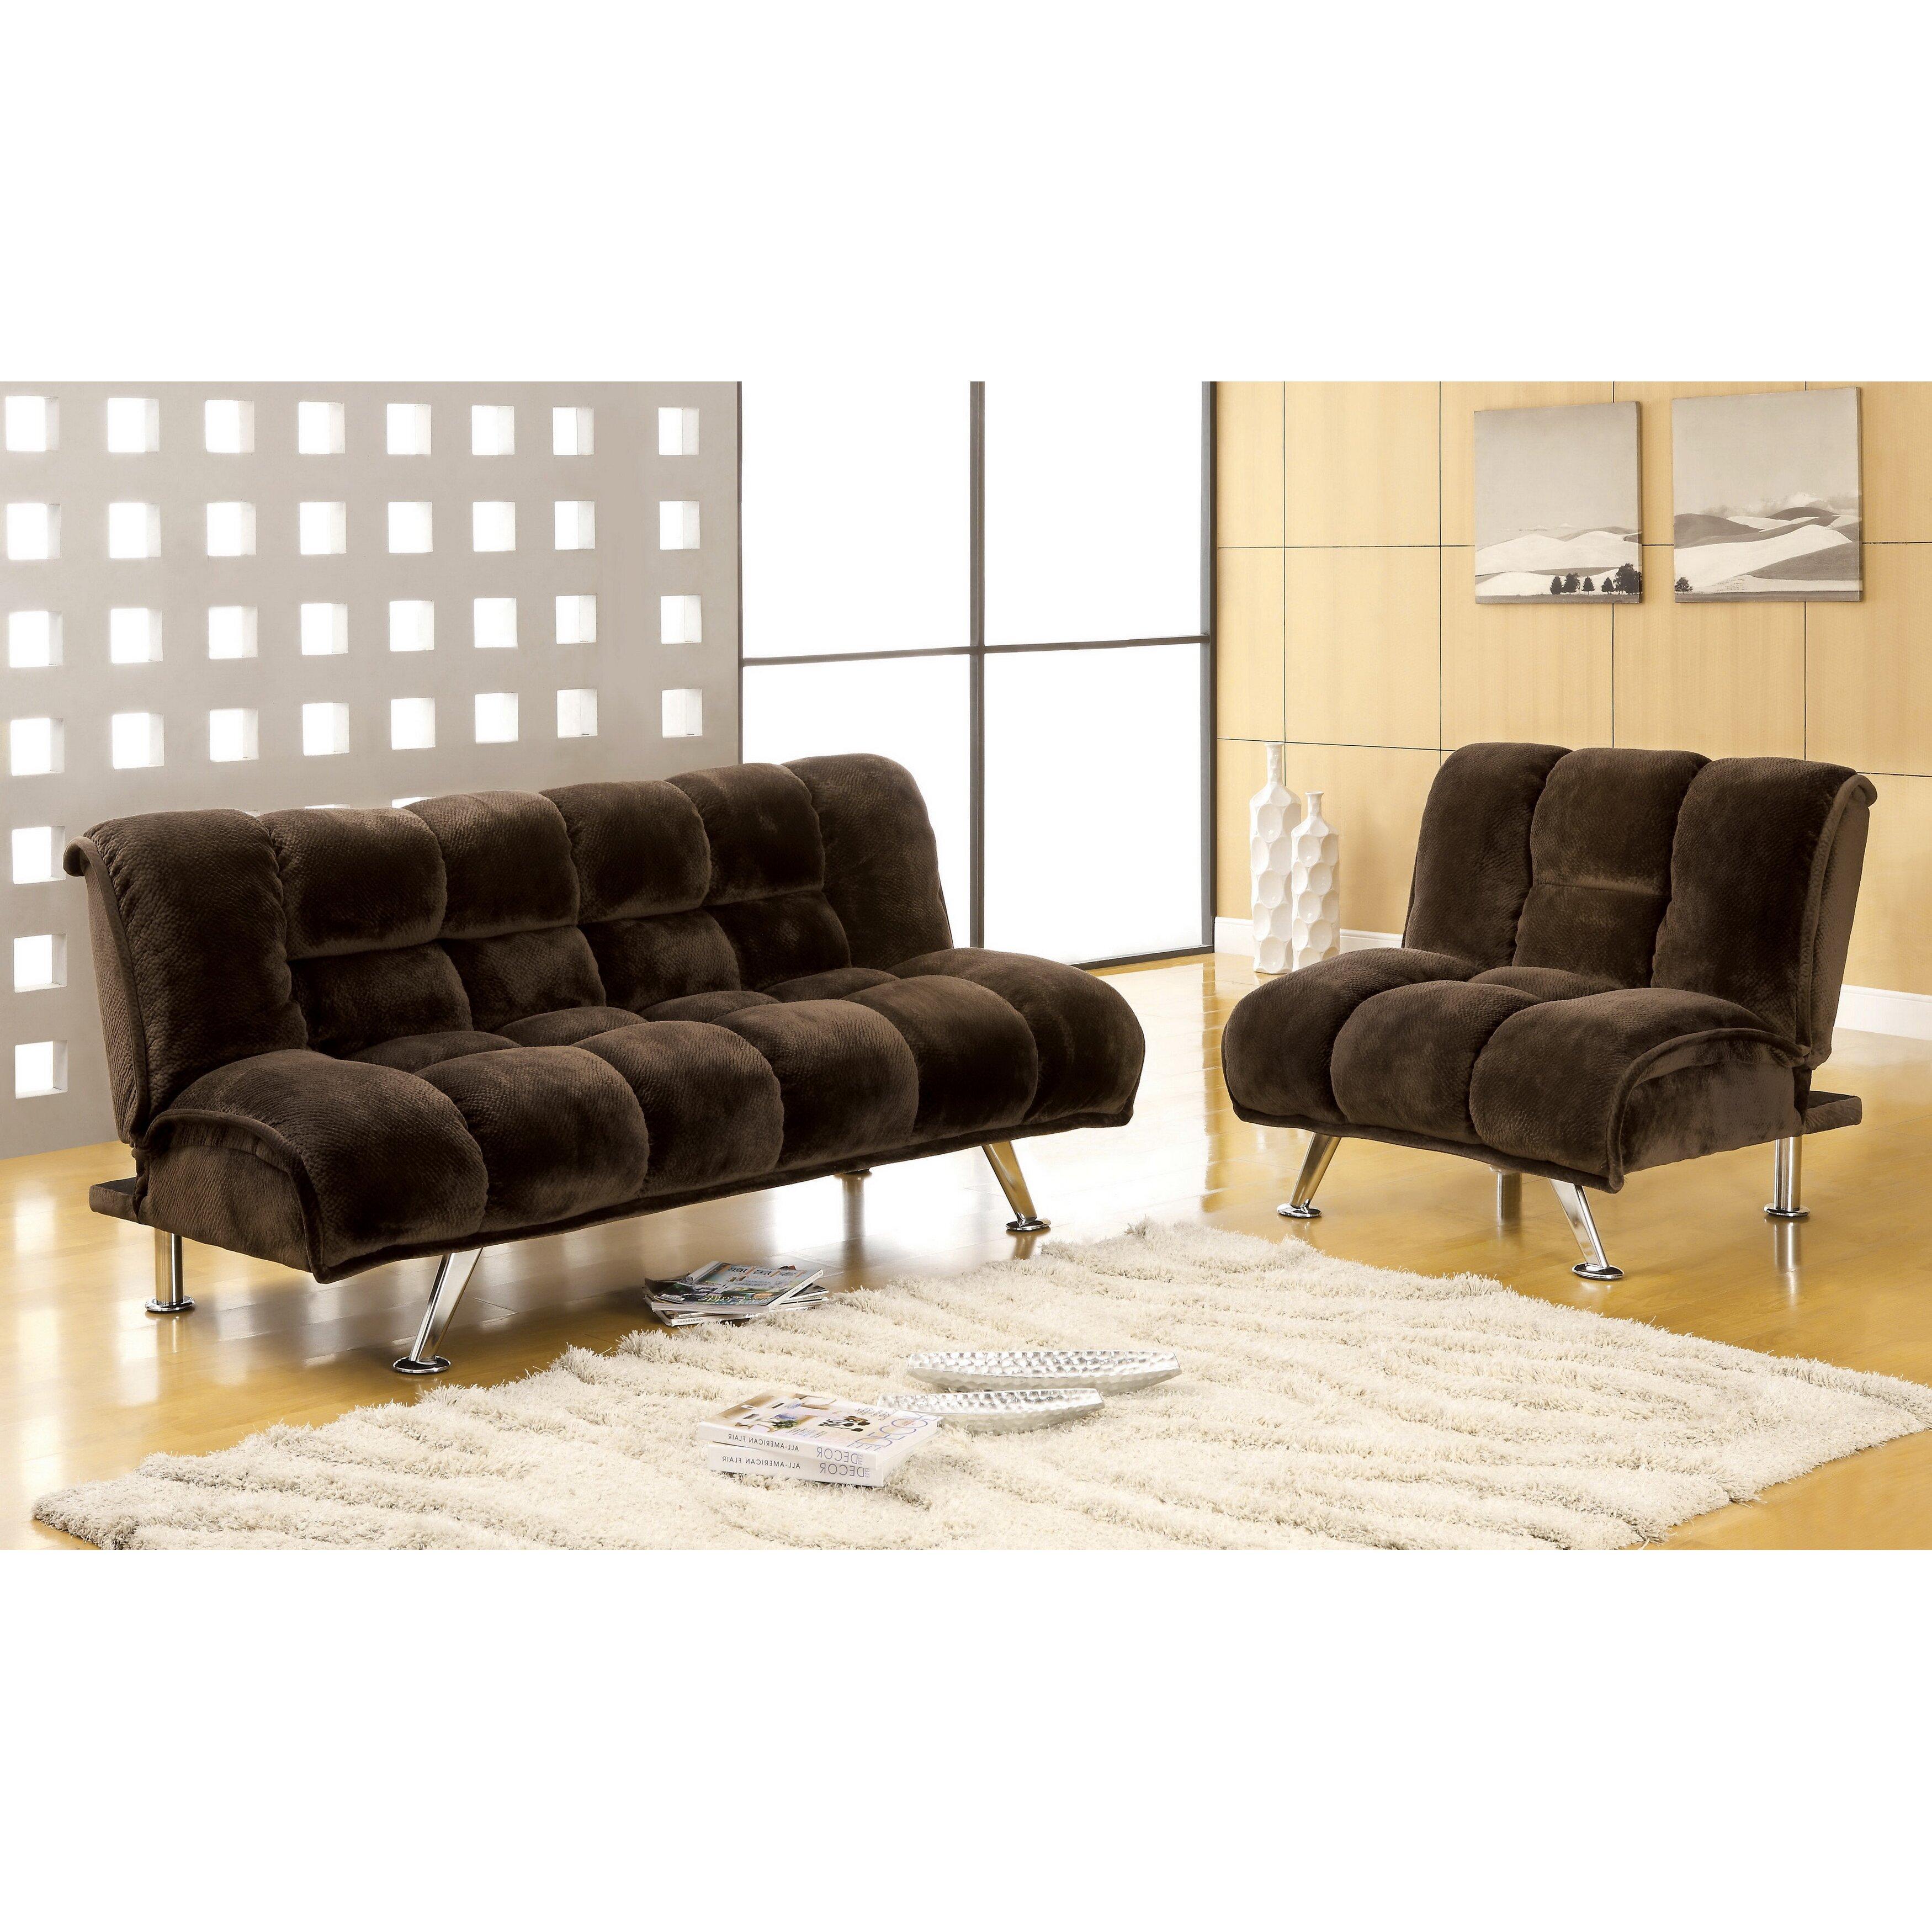 designs jopelli flannel sleeper sofa and chair set reviews wayfair